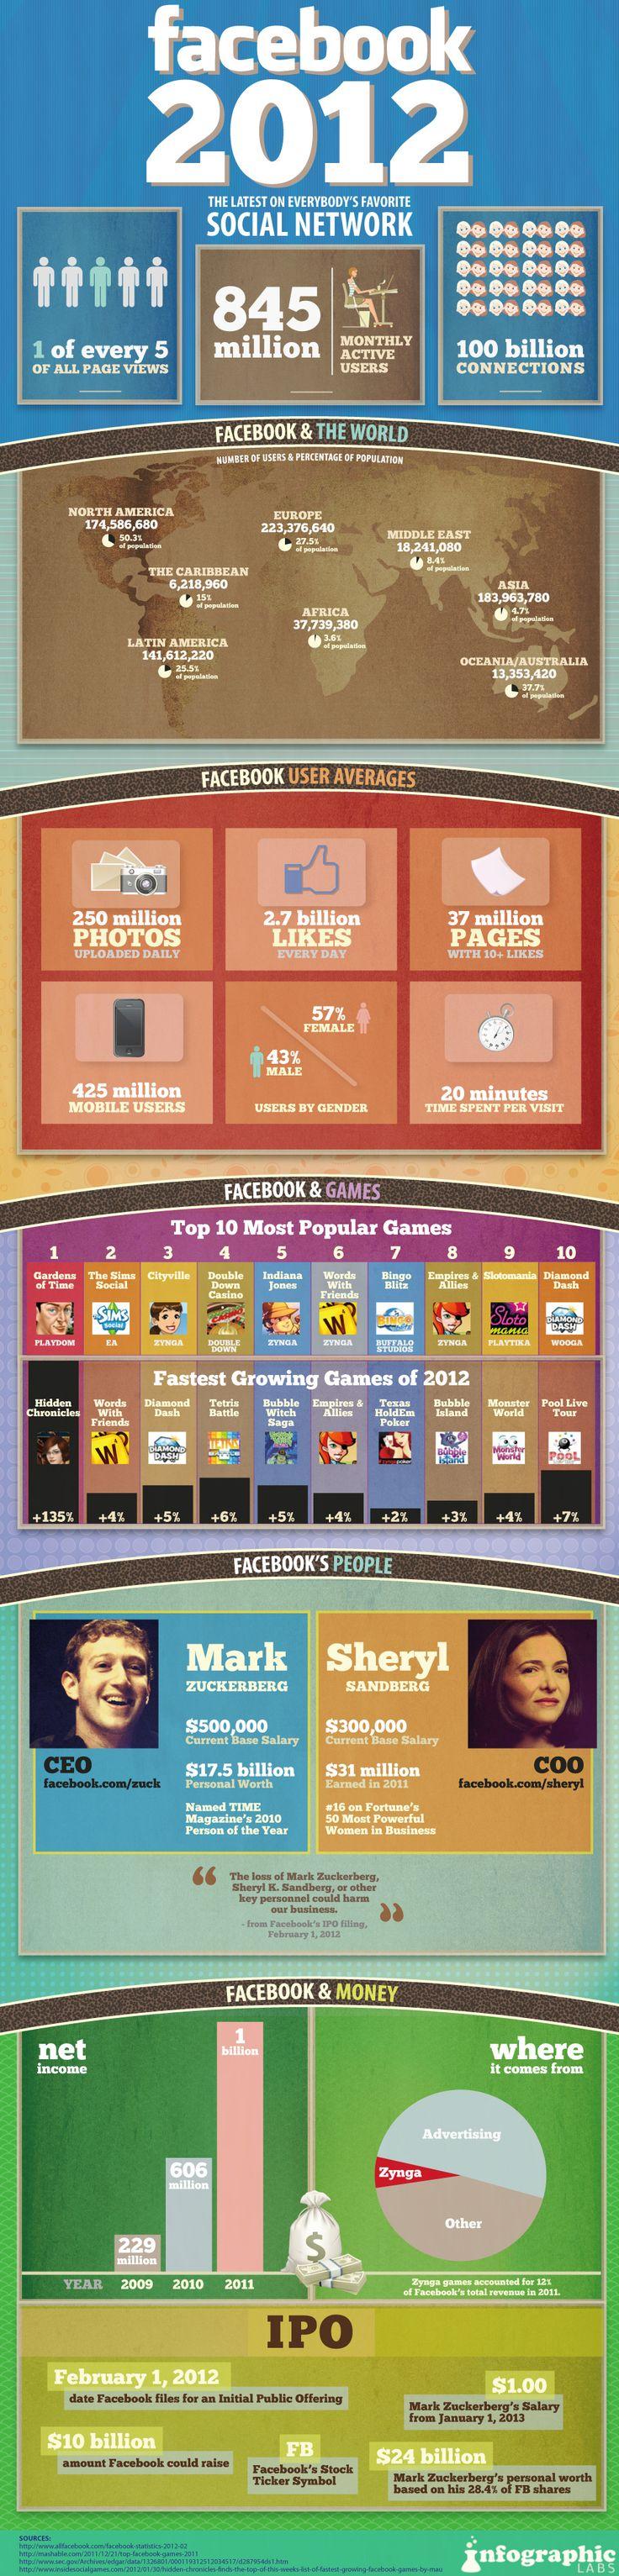 Facebook 2012 stats